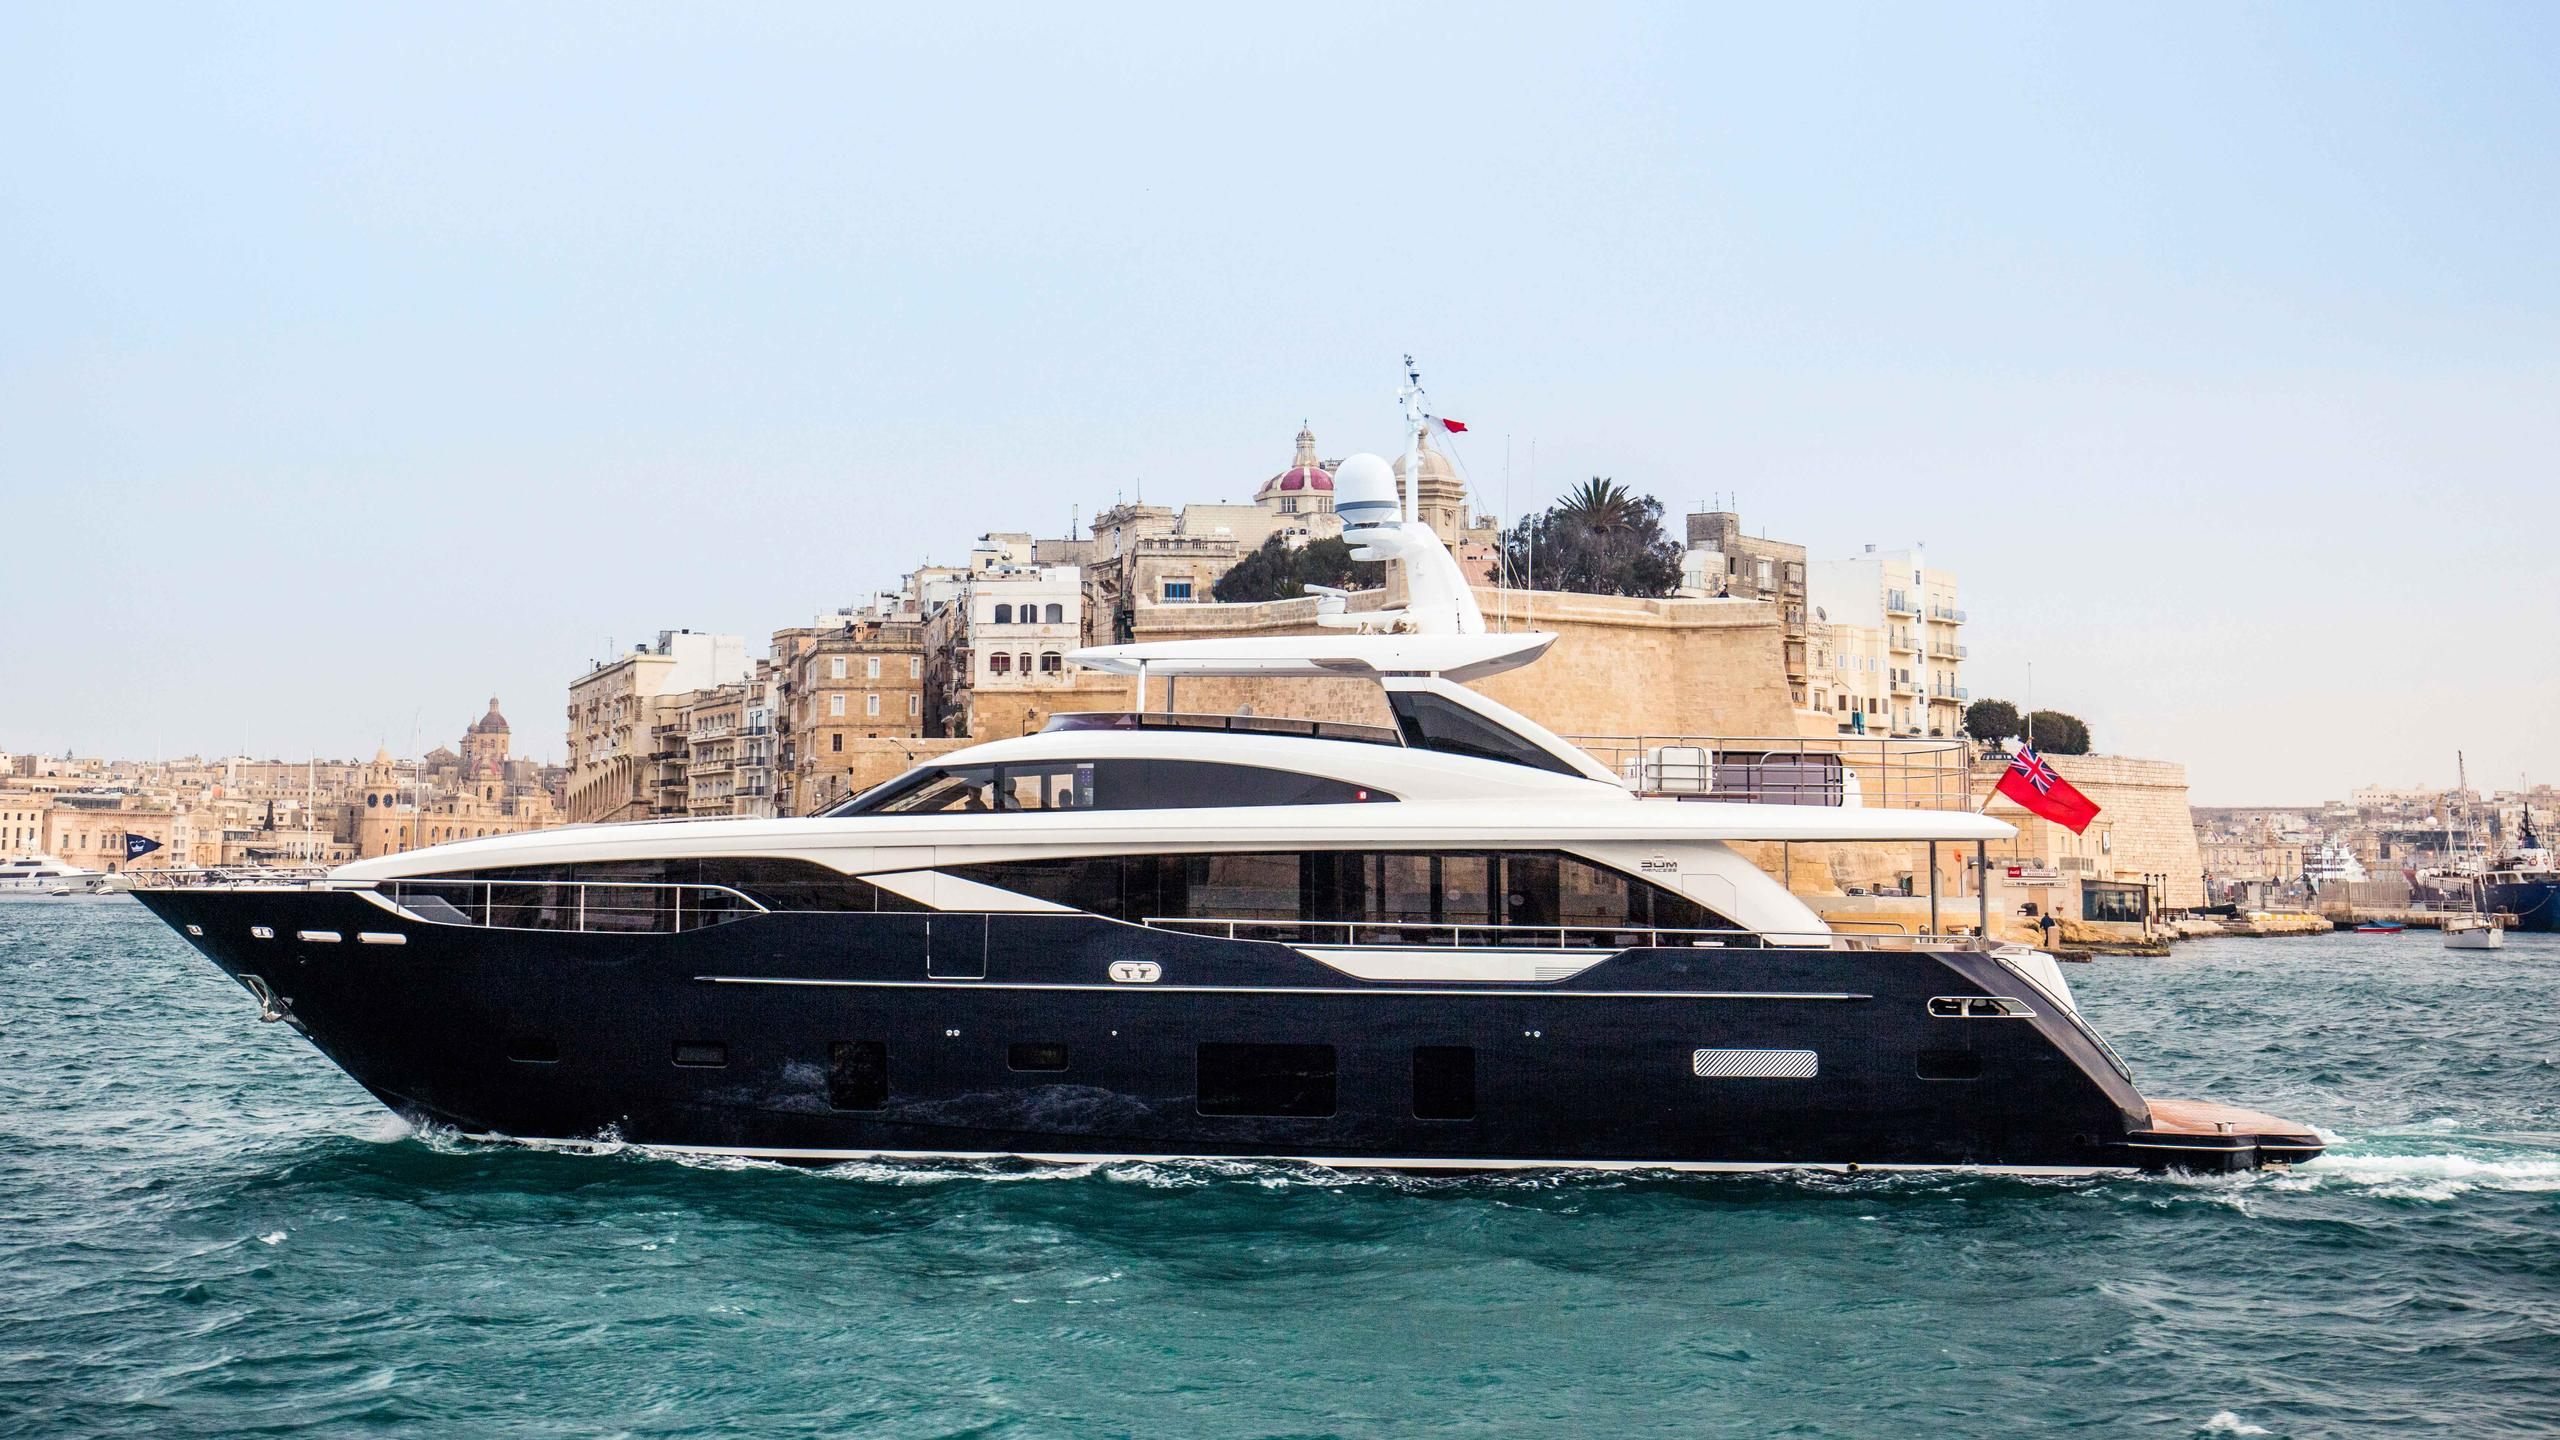 kohuba-motor-yacht-princess-2016-30m-profile-cruising